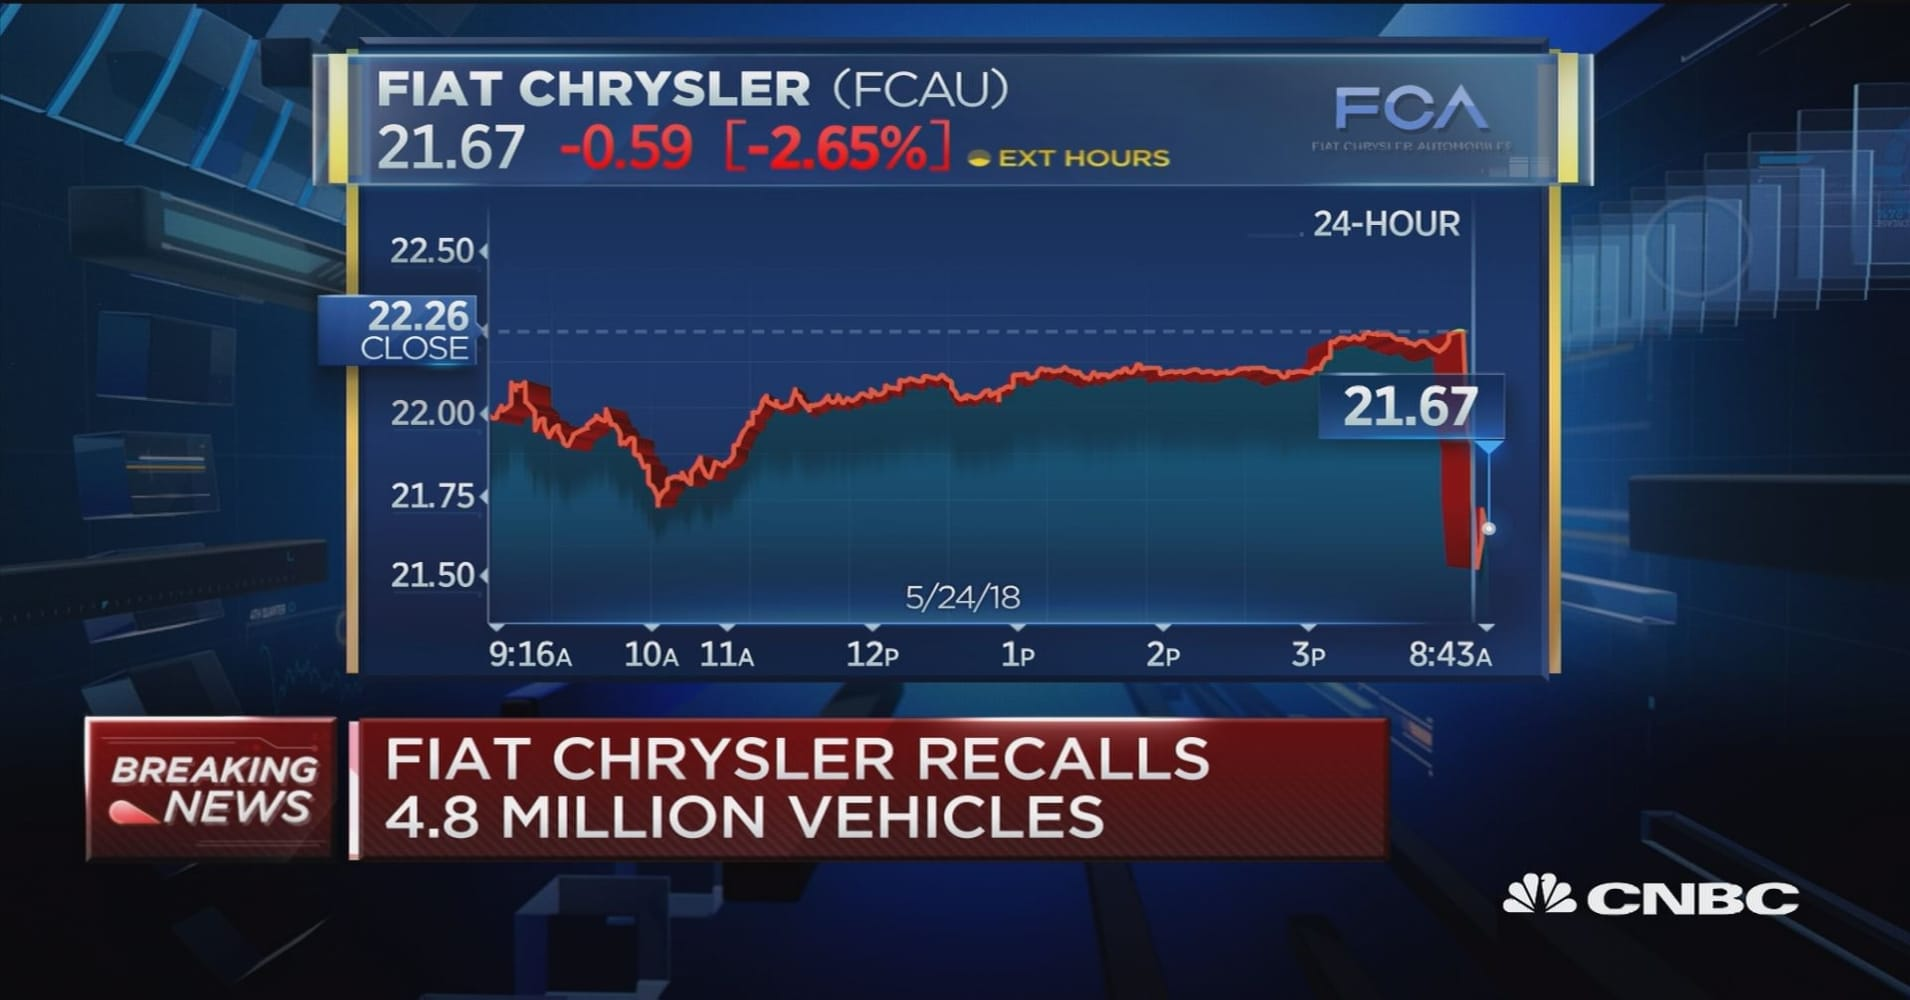 Fiat Chrysler recalls 4.8 million vehicles, shares fall